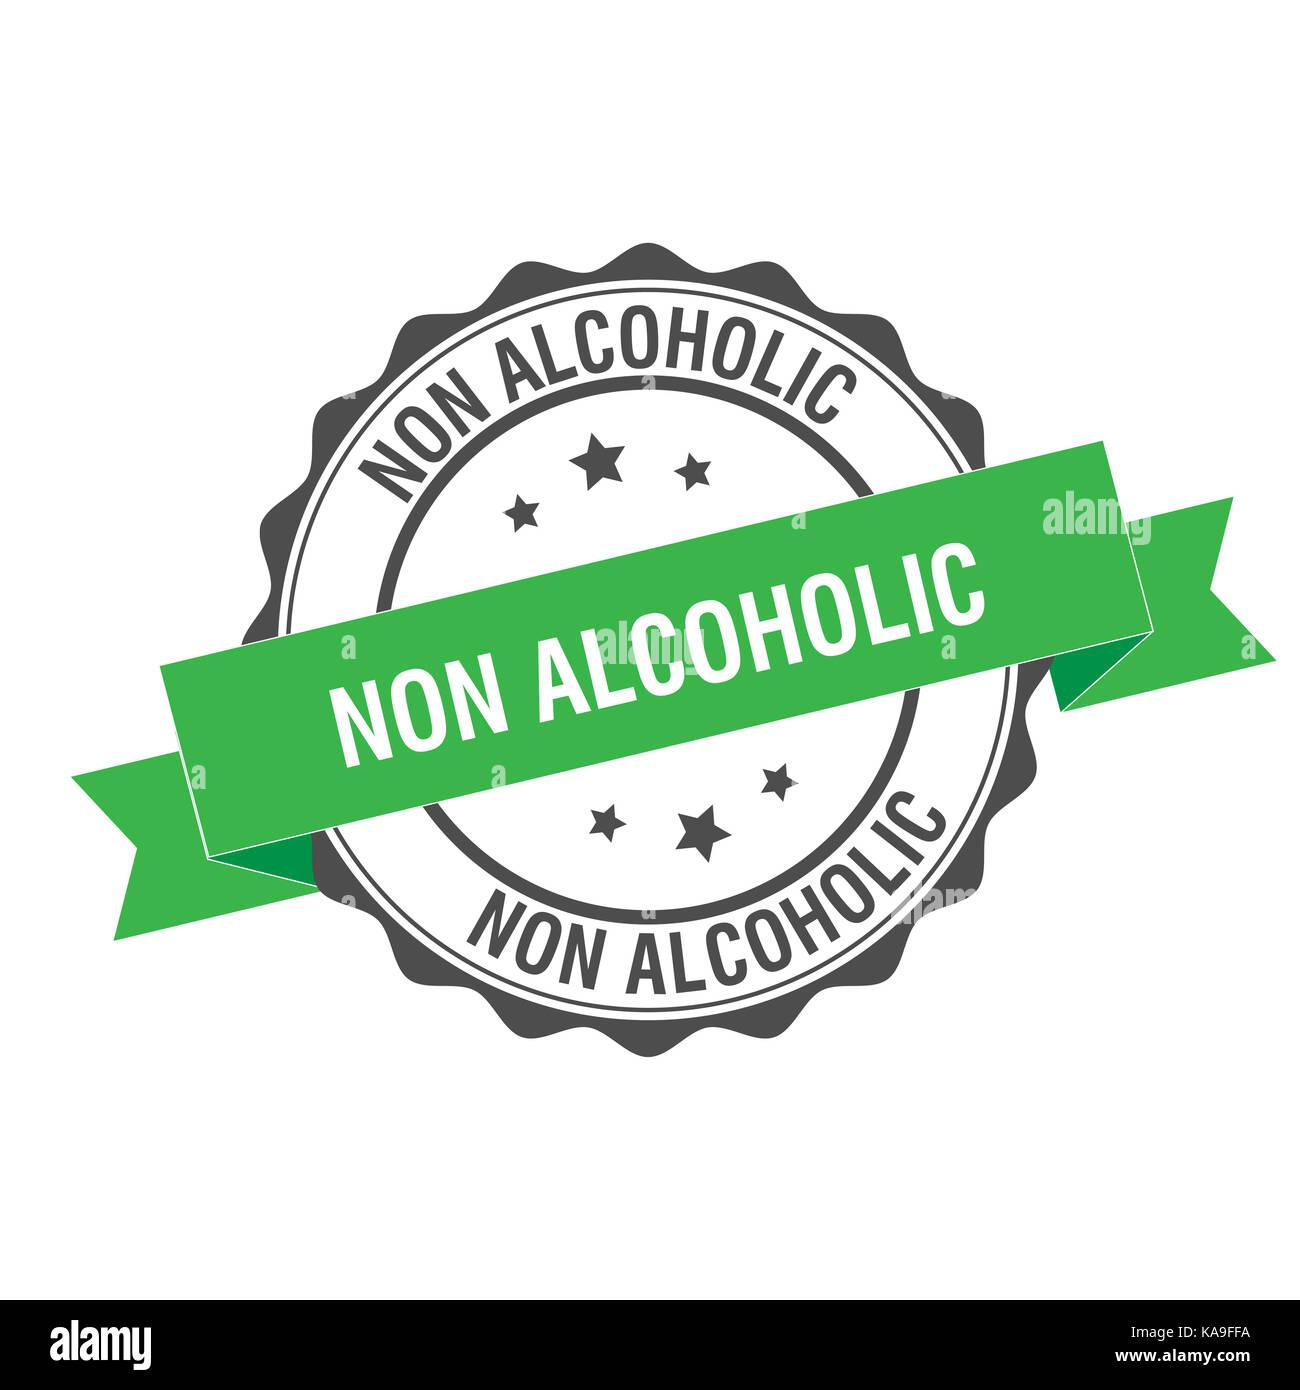 Non alcoholic stamp illustration - Stock Image